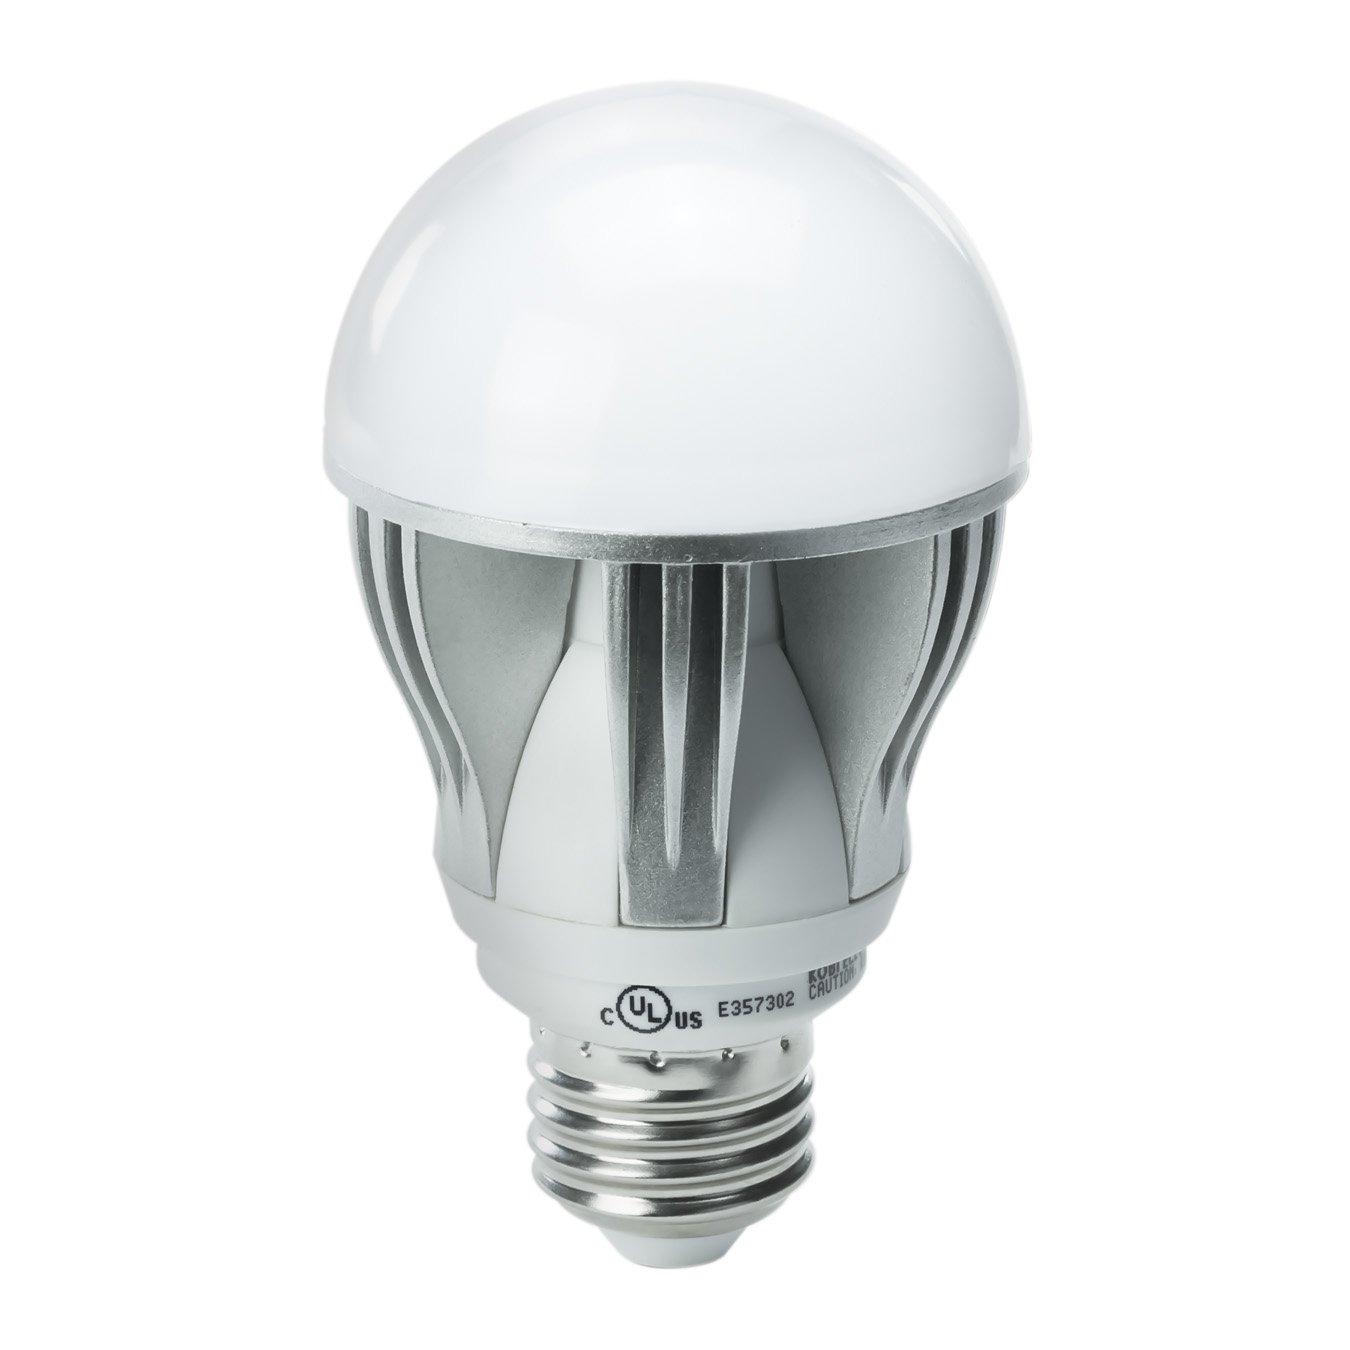 kobi electric k2l1 15 watt 75 watt a19 led 5000k cool white light bulb dimmab. Black Bedroom Furniture Sets. Home Design Ideas